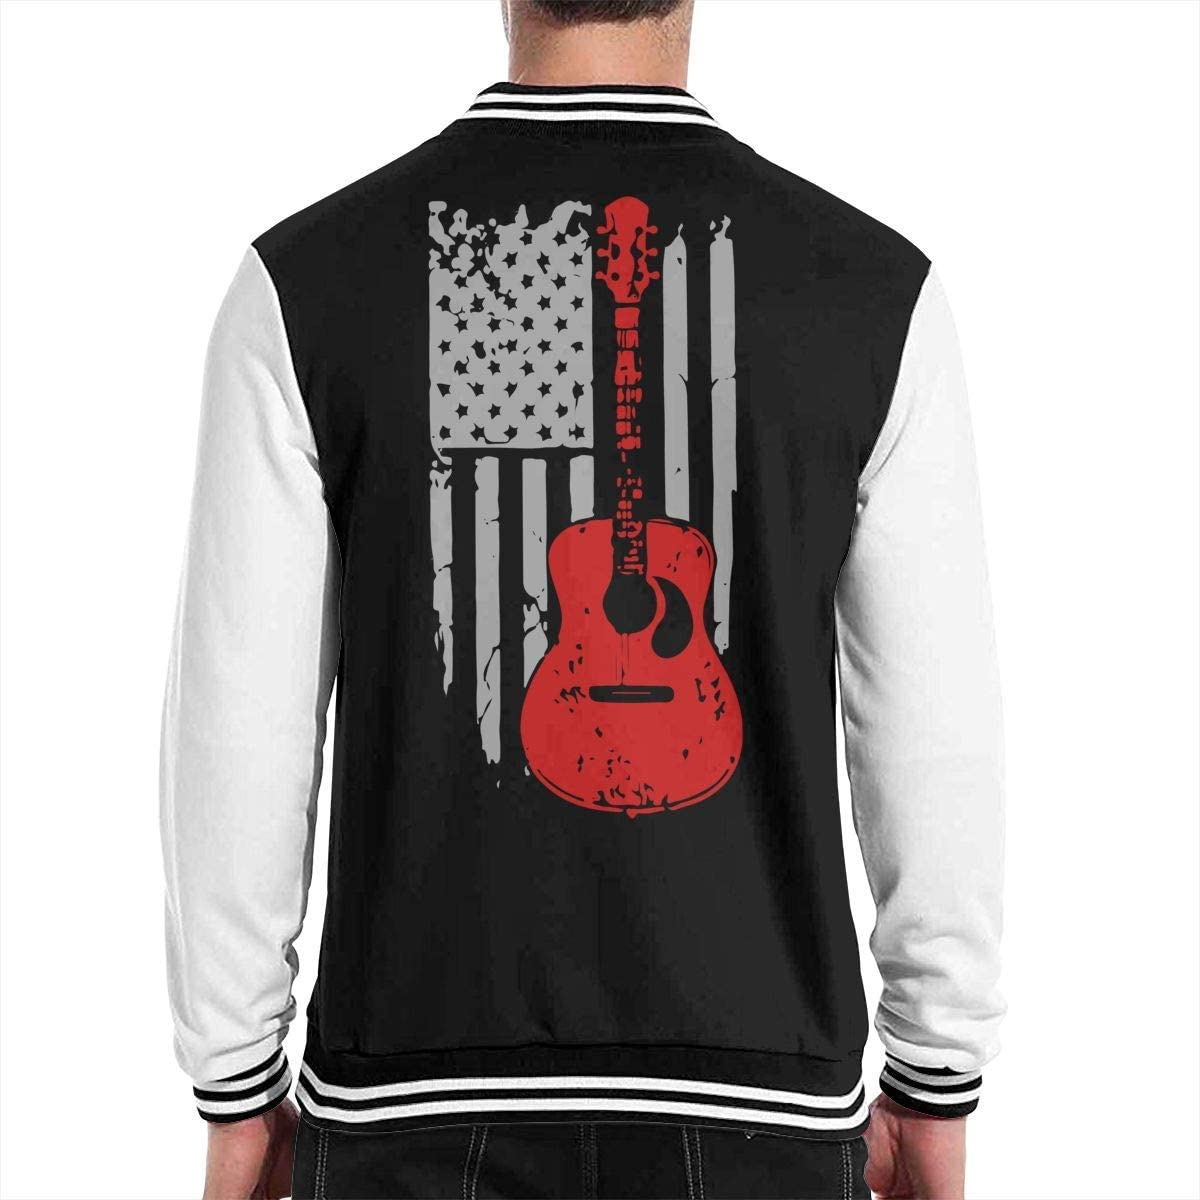 Motocross Racing Unisex Baseball Jacket Coat Slim Varsity Sweatshirt Coat